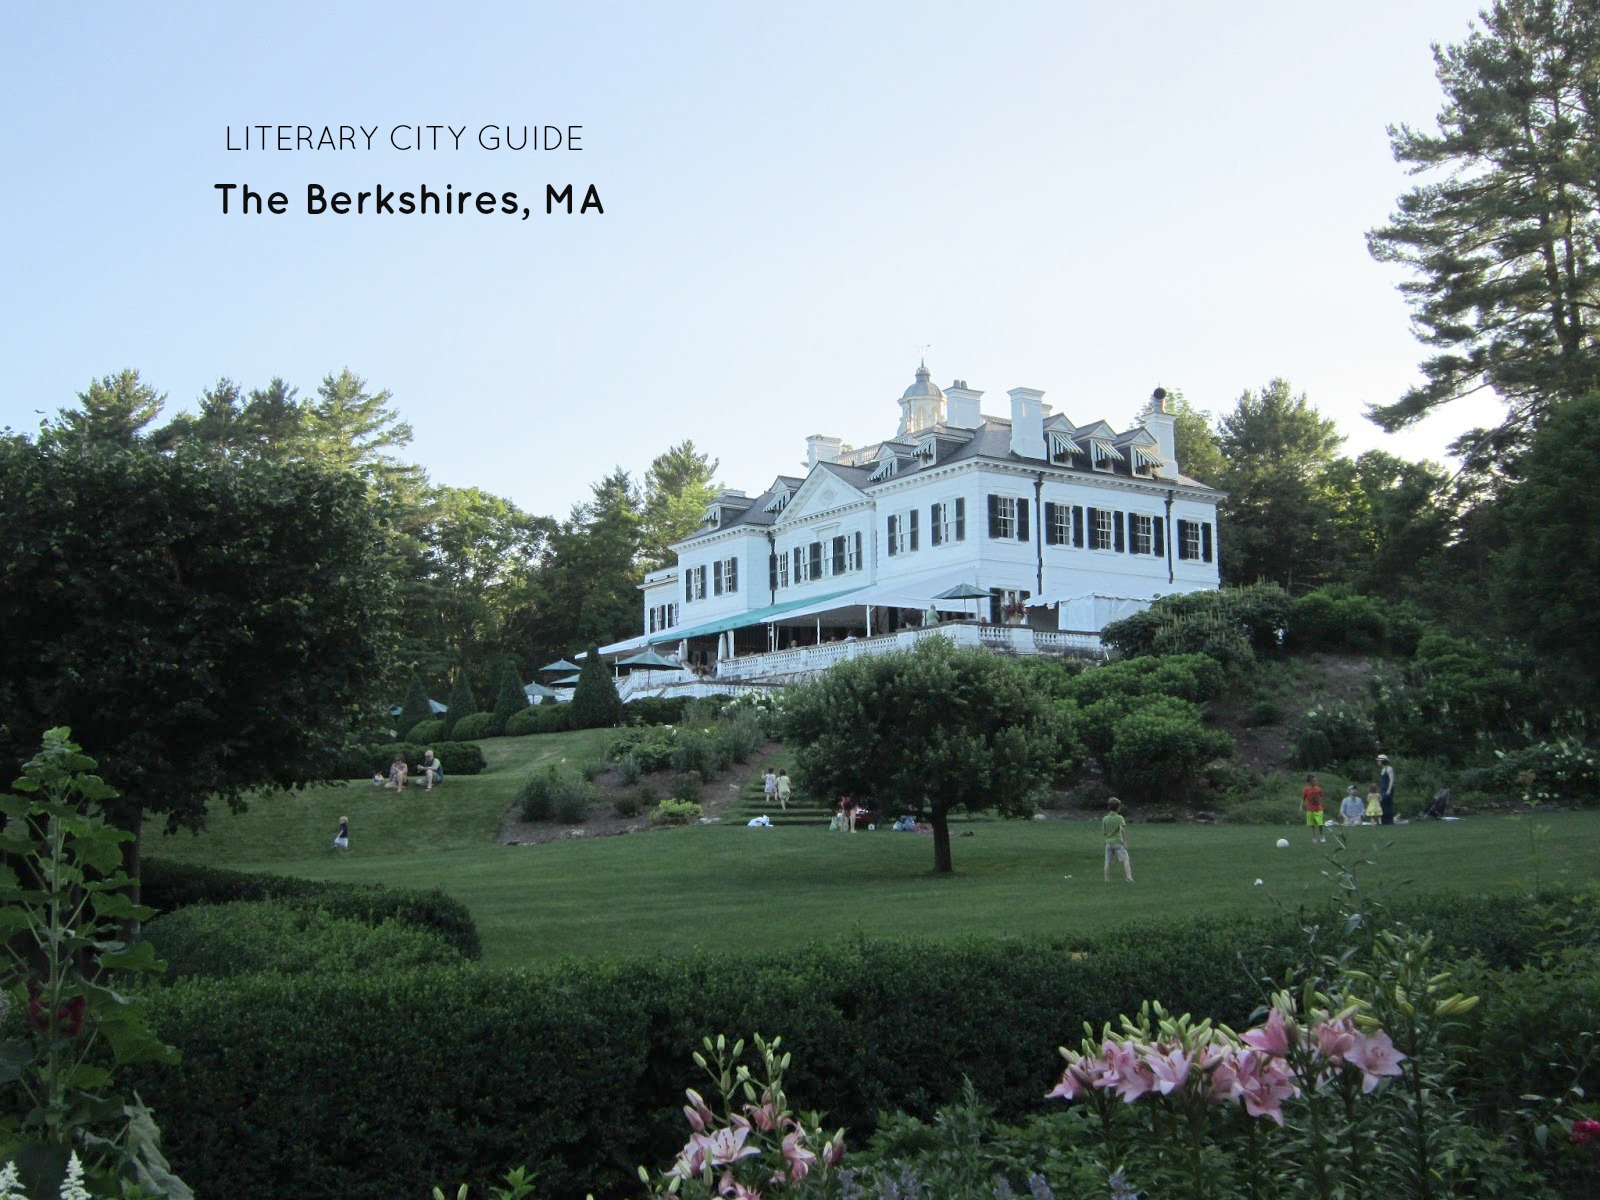 City Guide_Berkshires.jpg.jpg